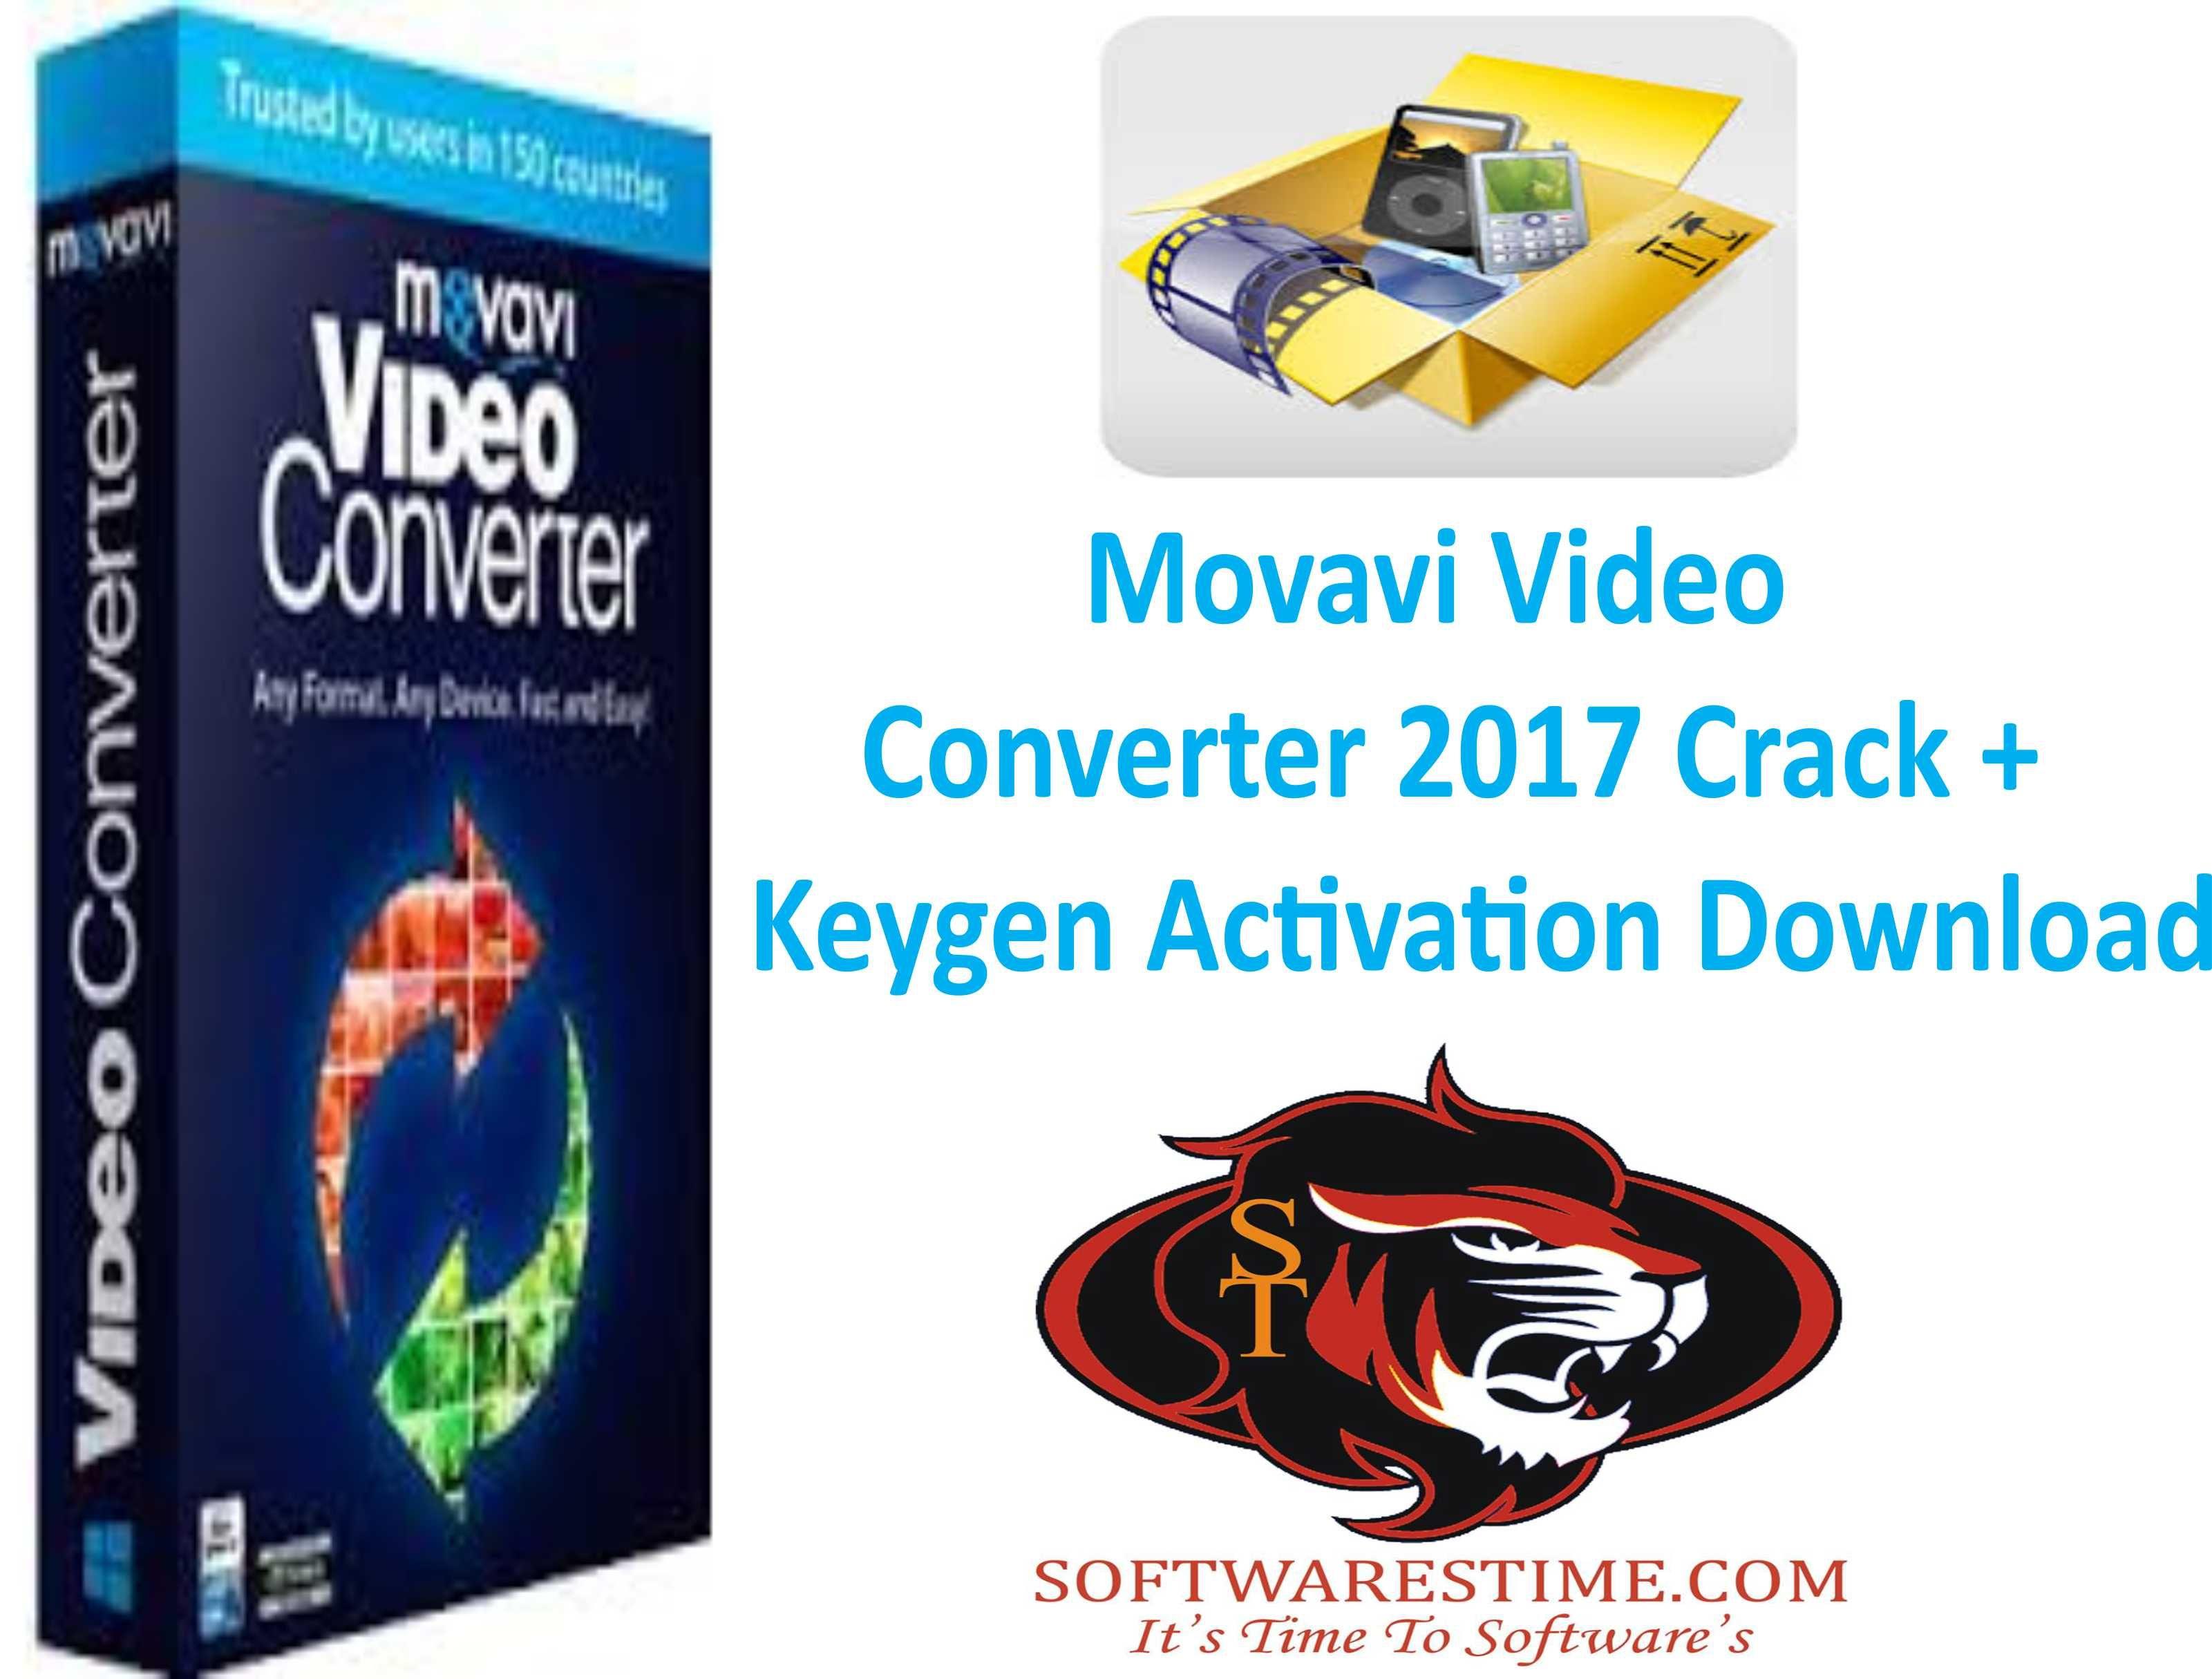 avast antivirus free download with key